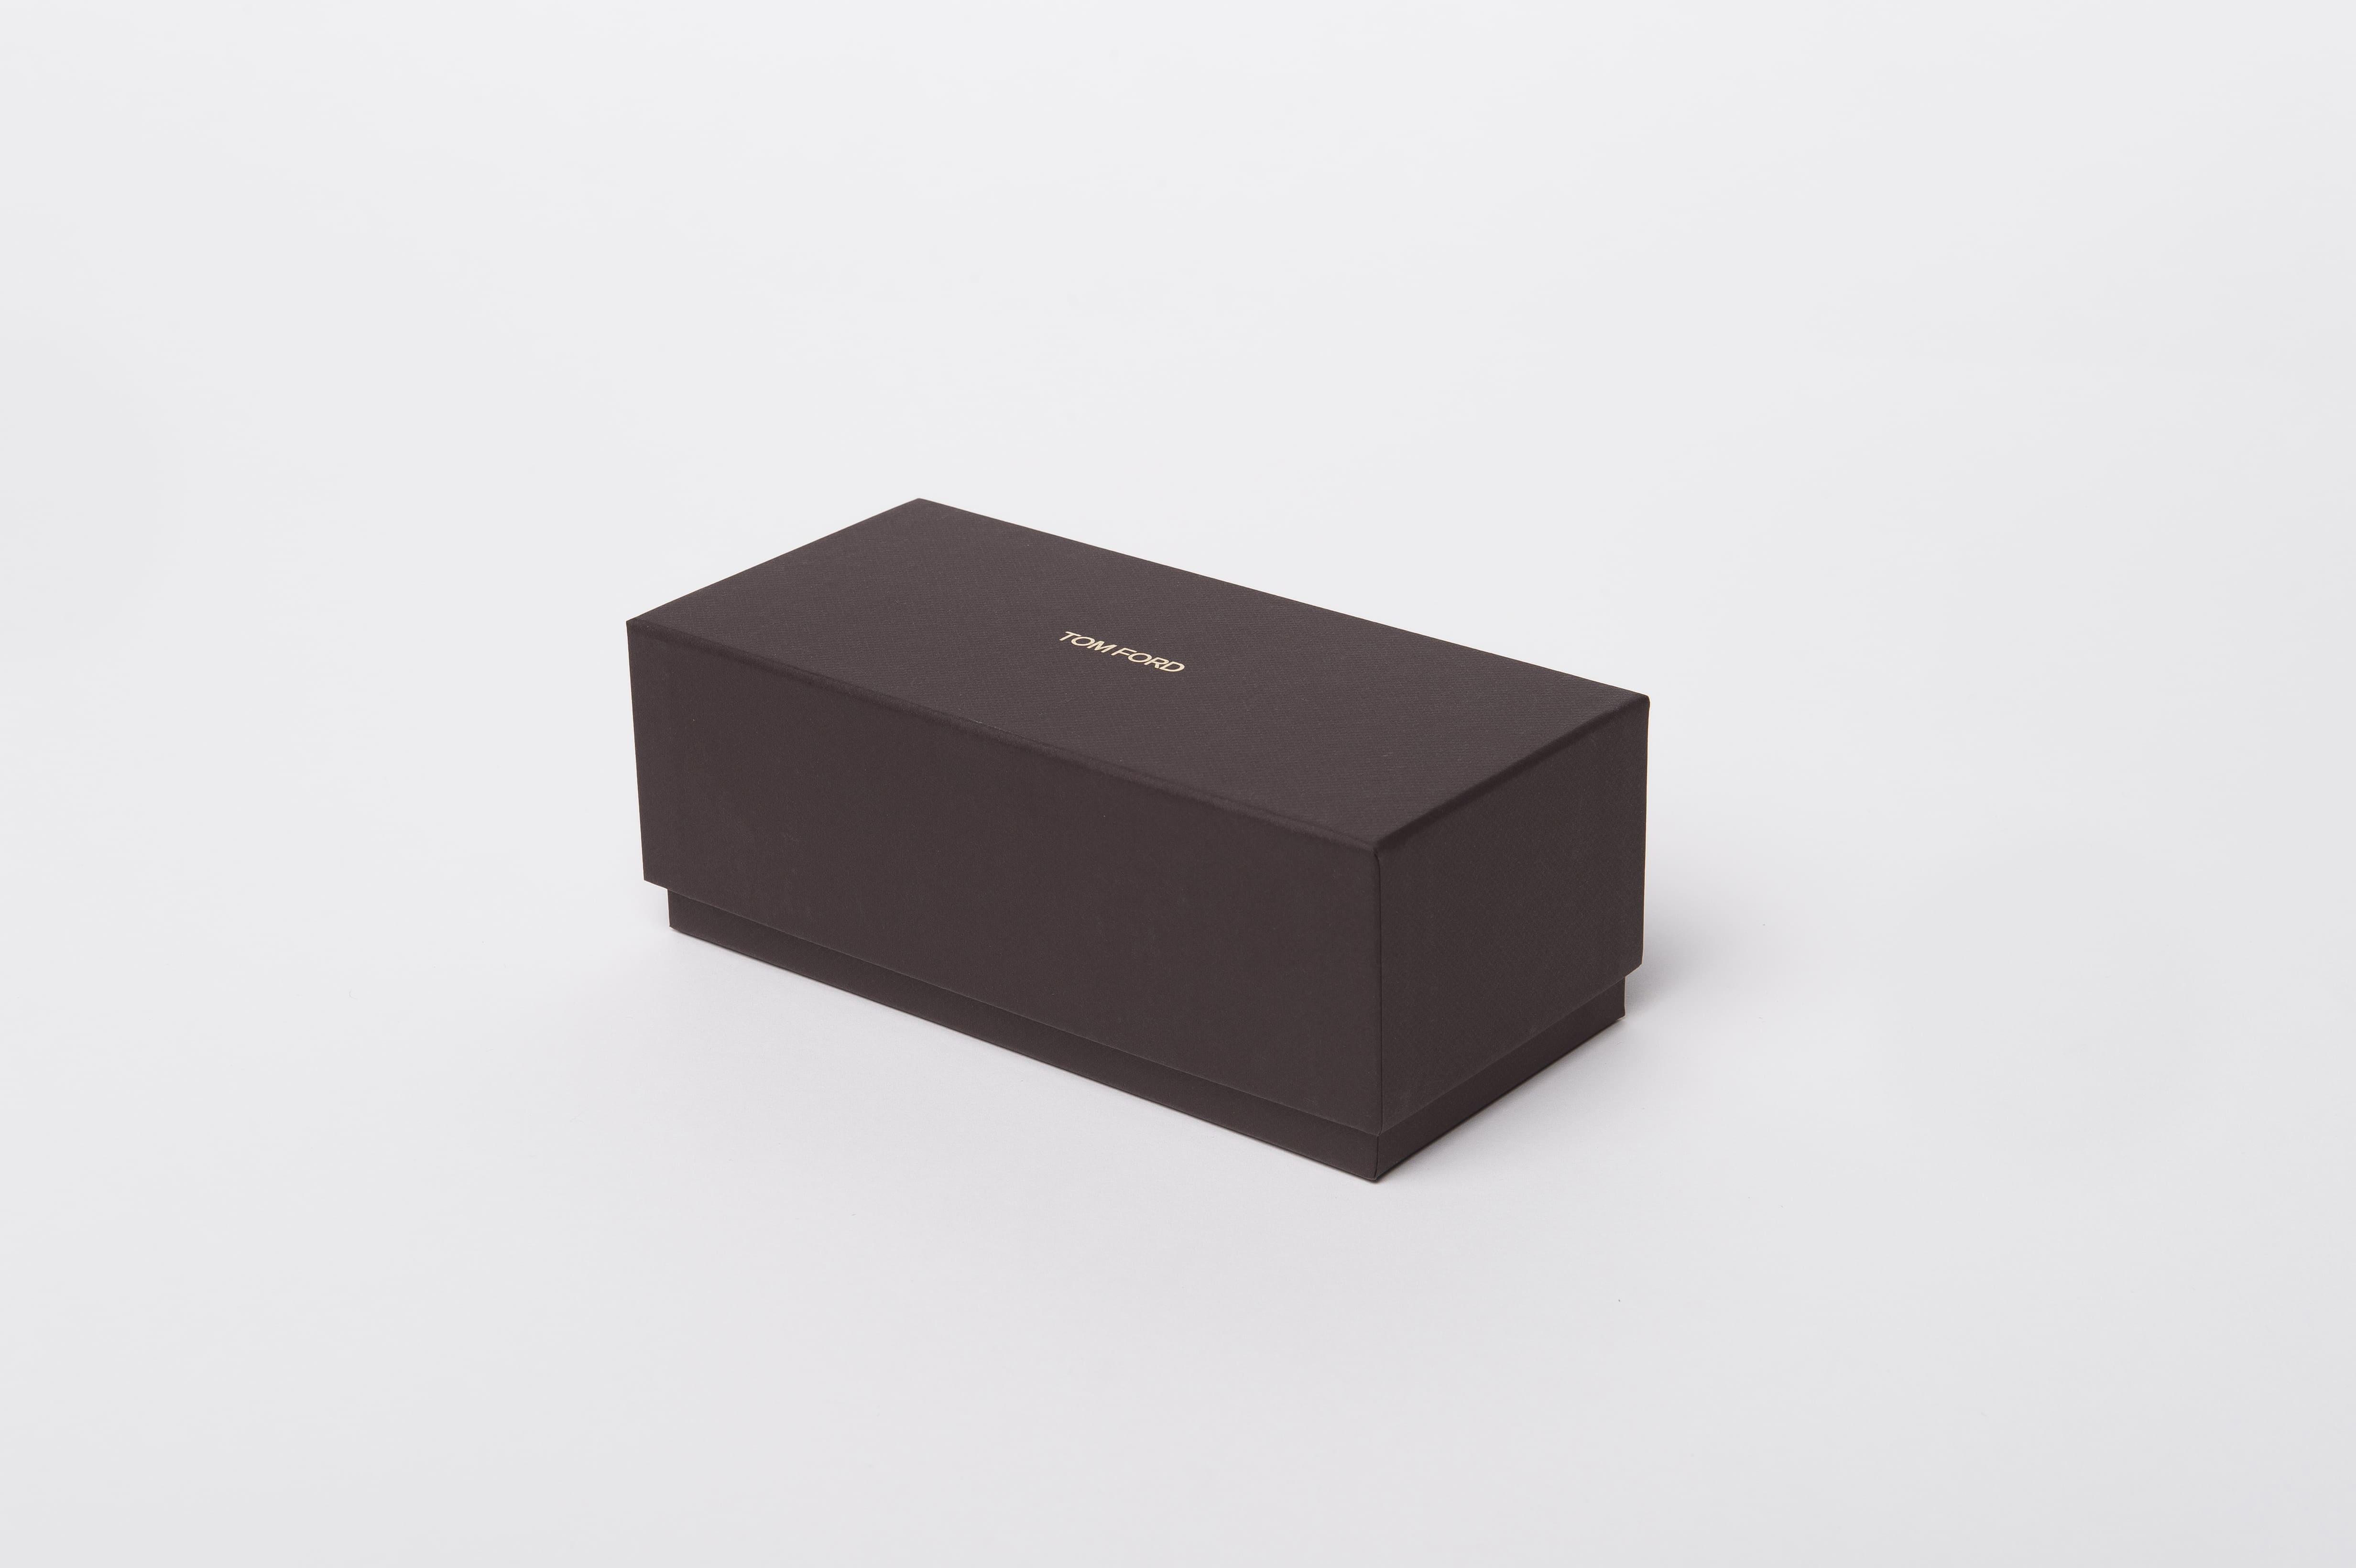 scatola portaocchiali Tom Ford